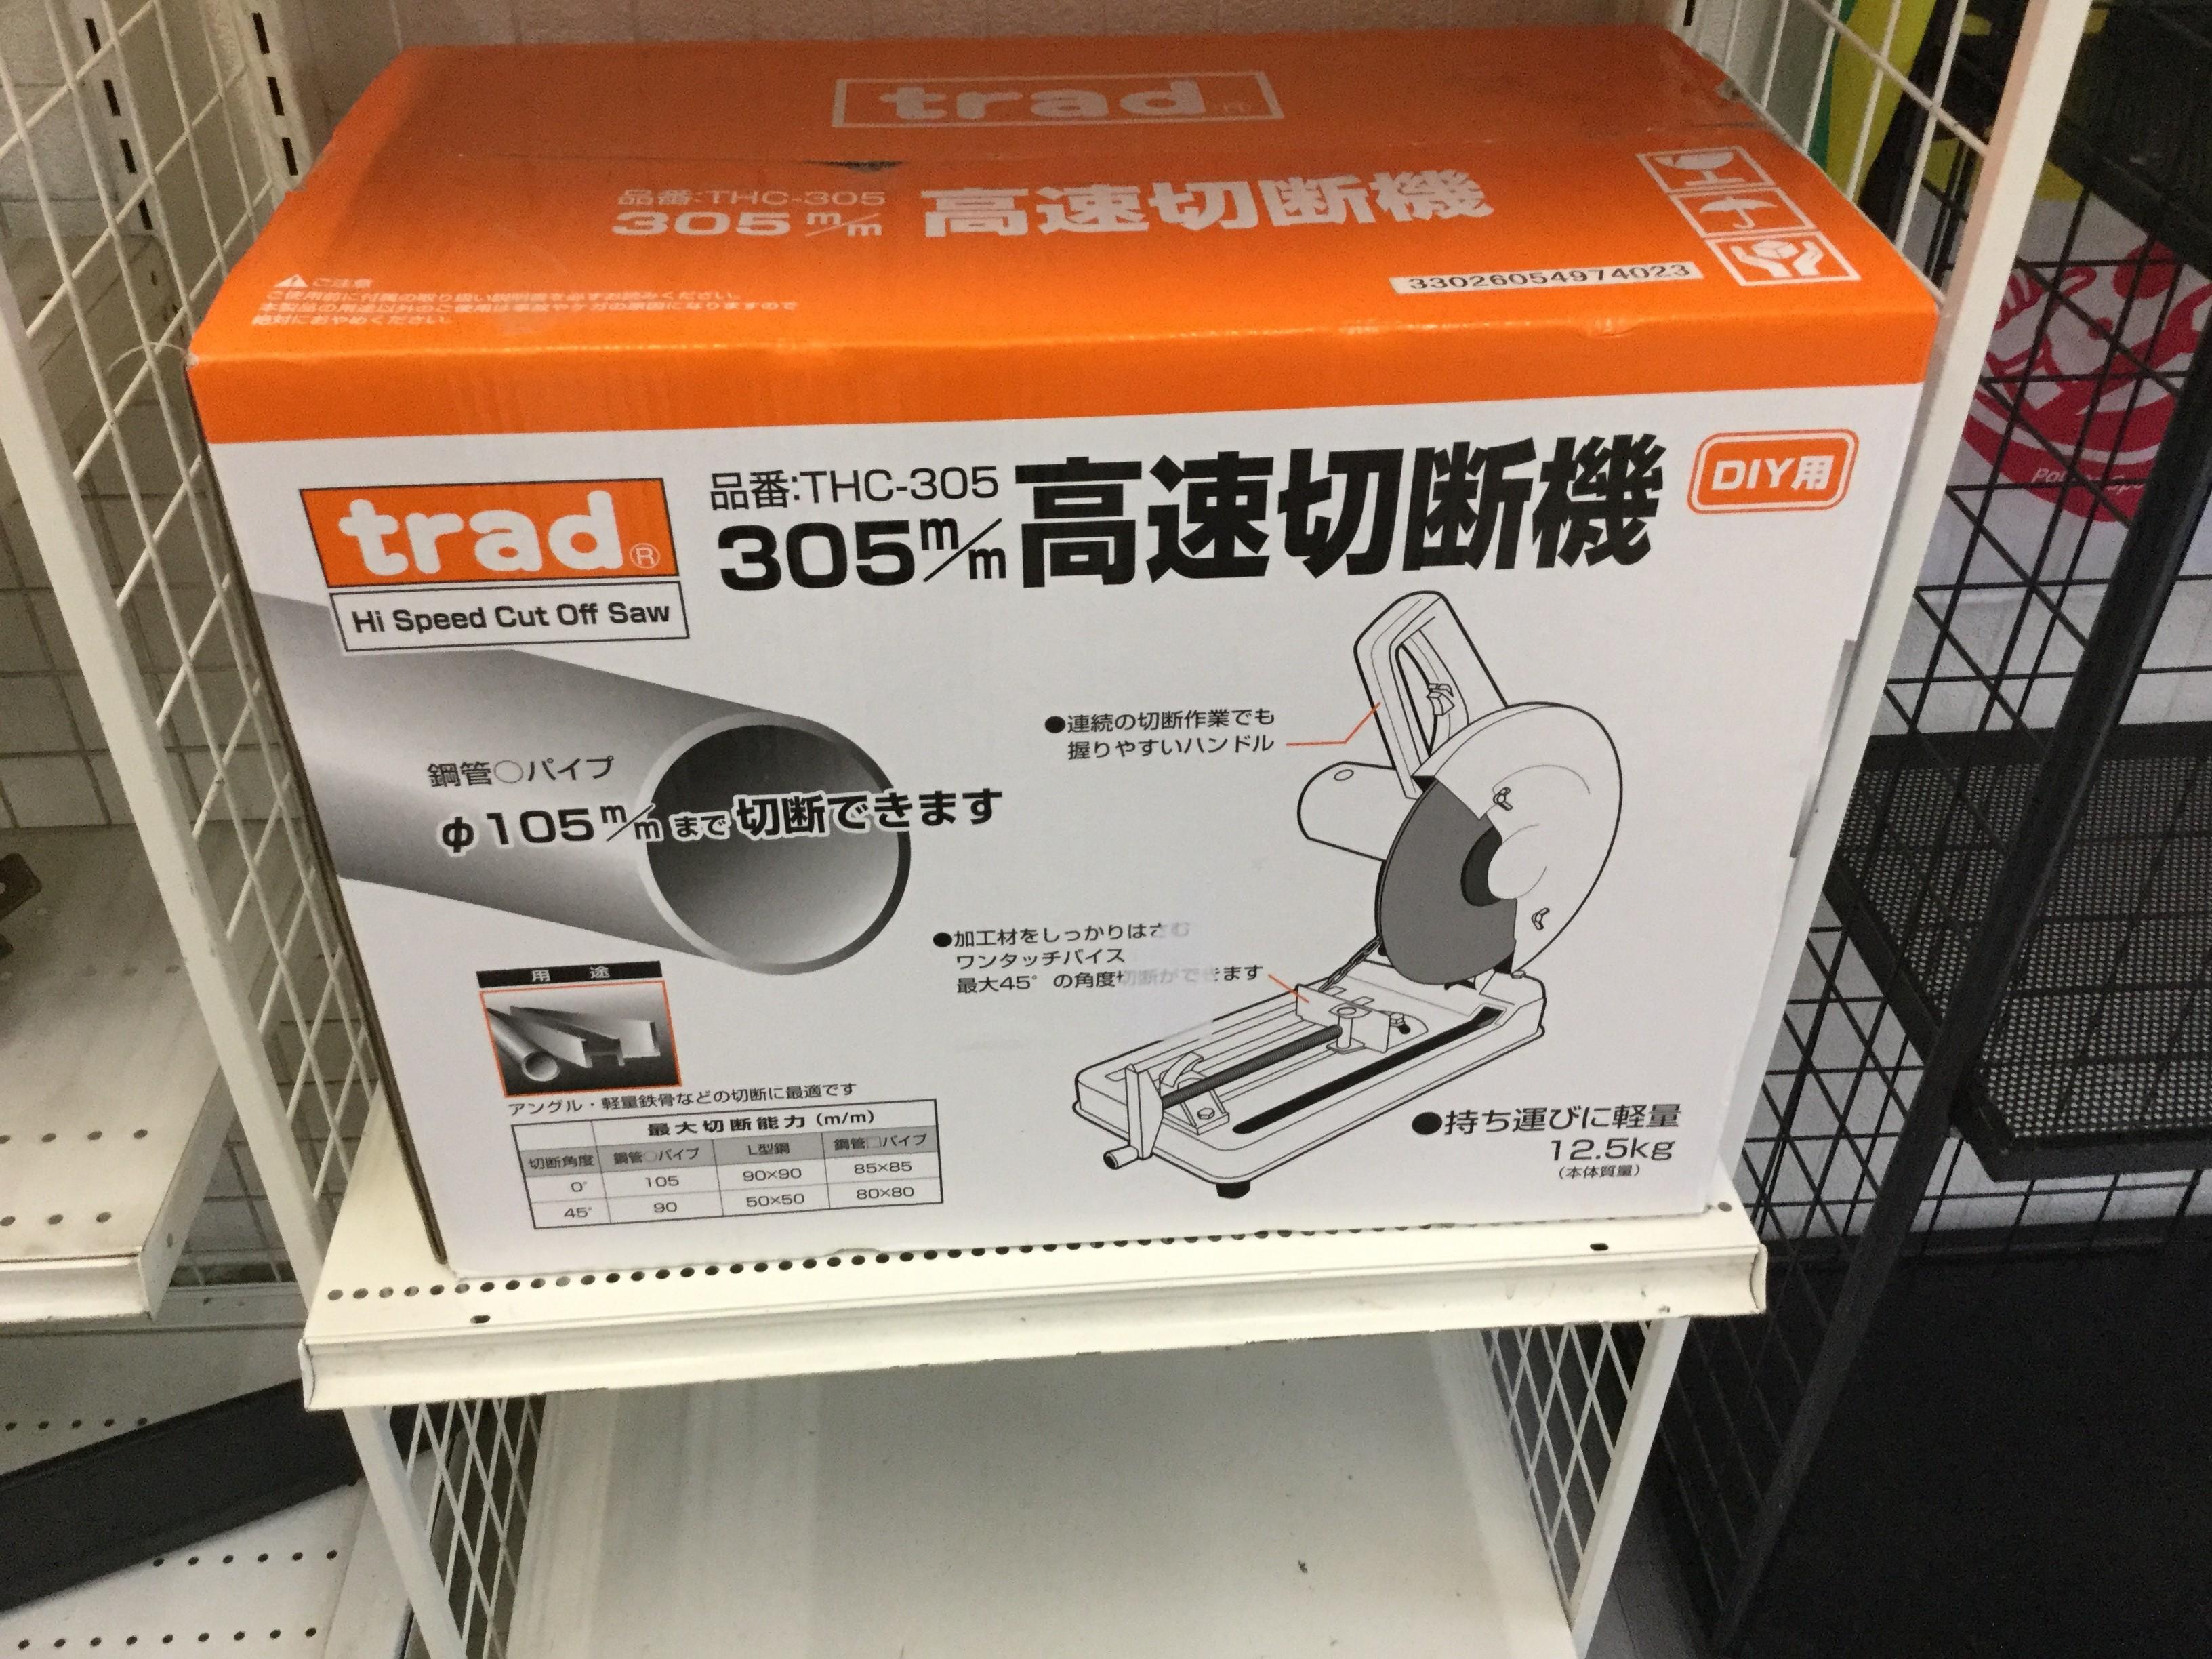 trsdのTHC-305高速切断機 DIY用